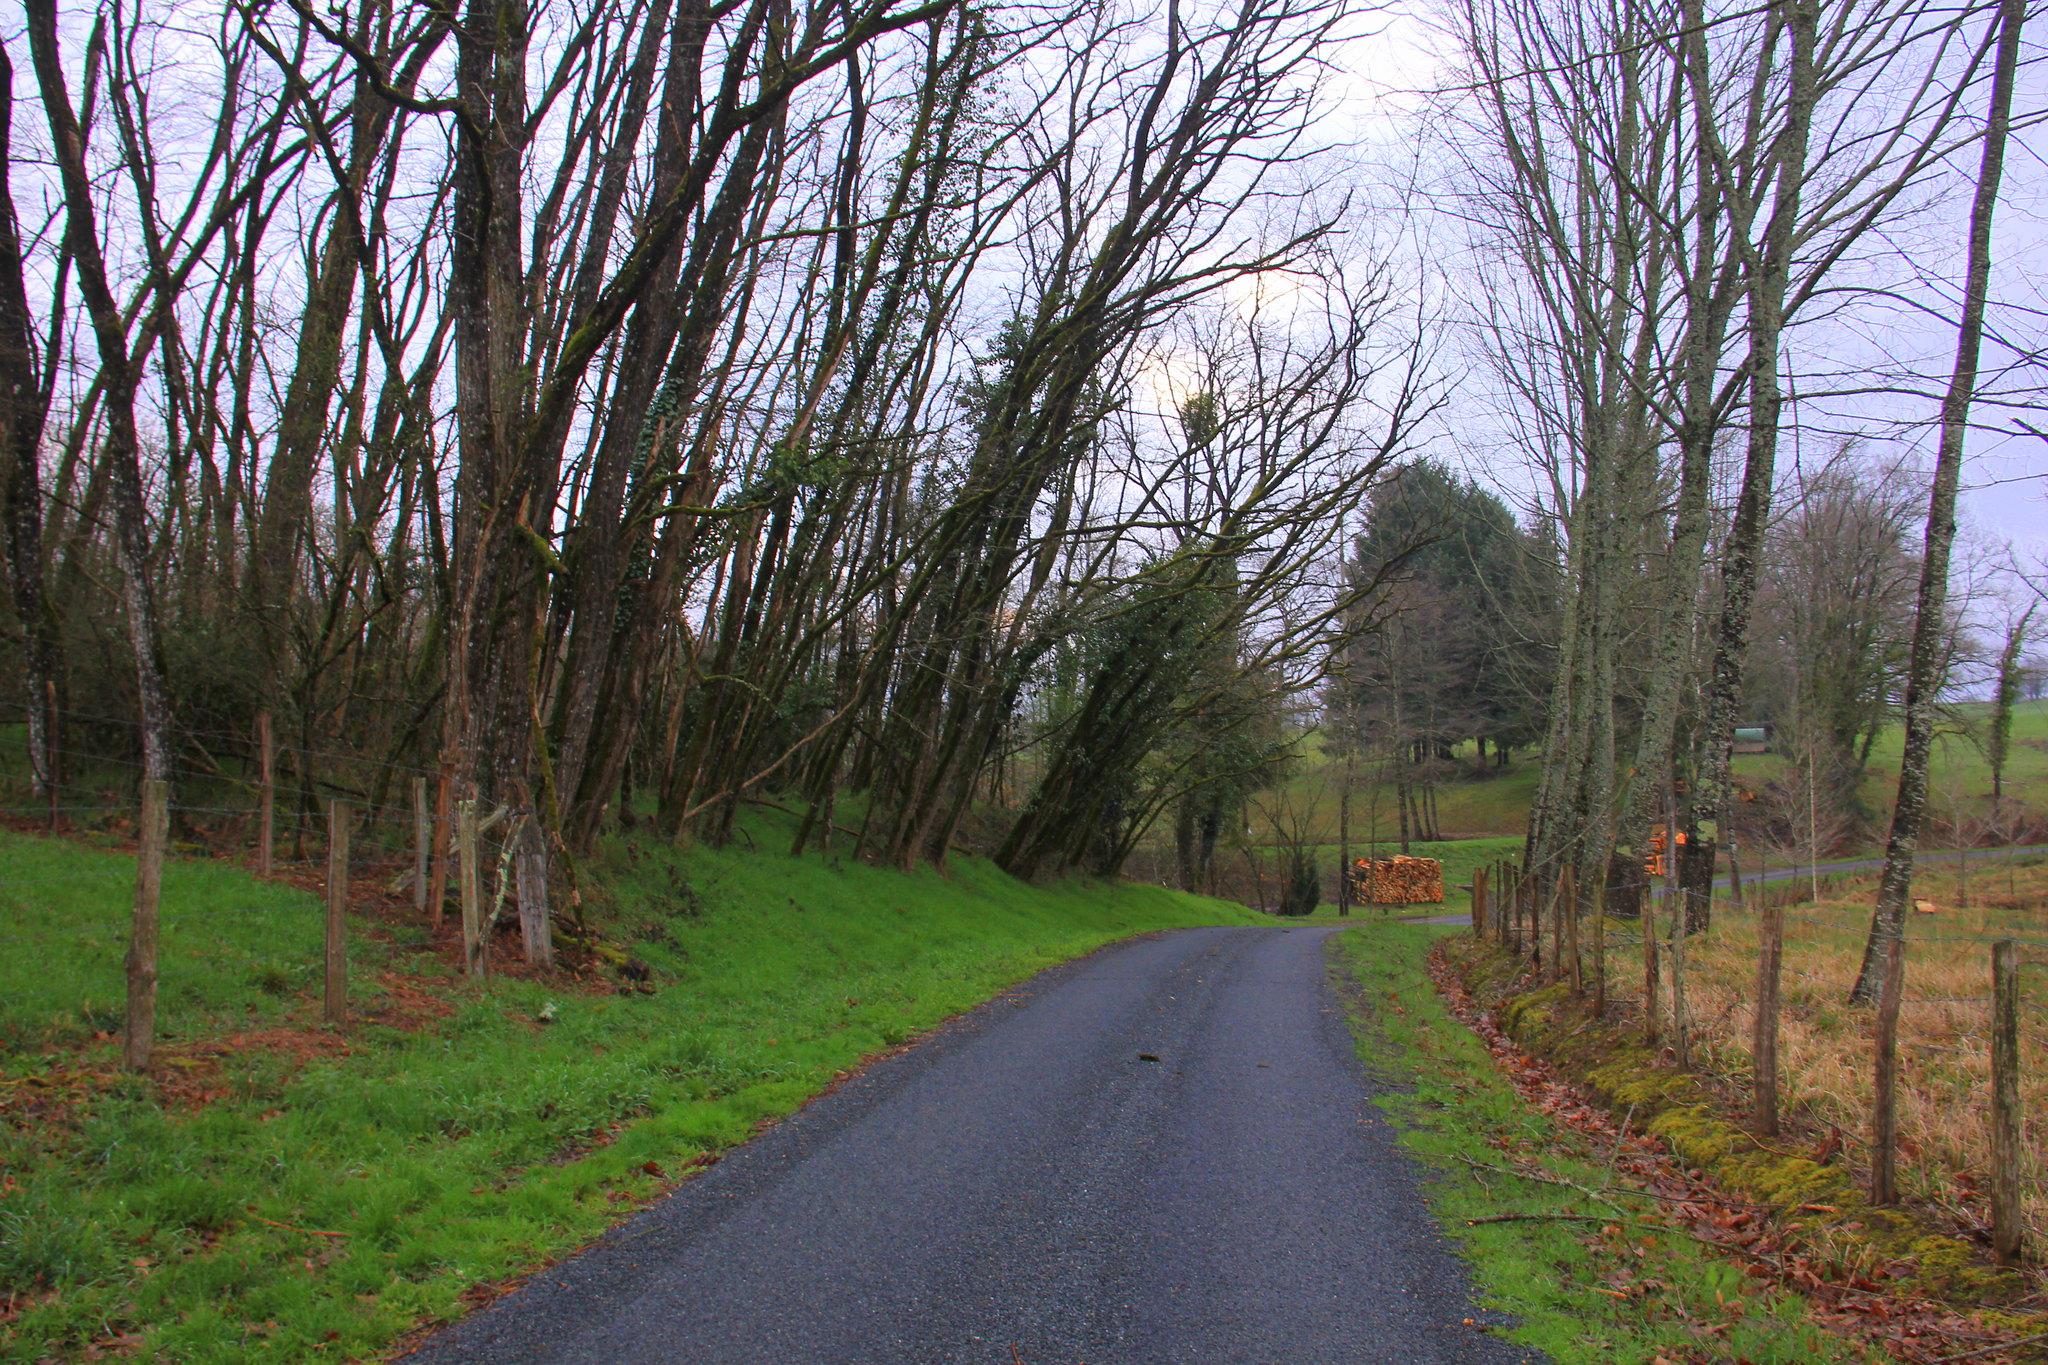 Rain wet roads of dordogne